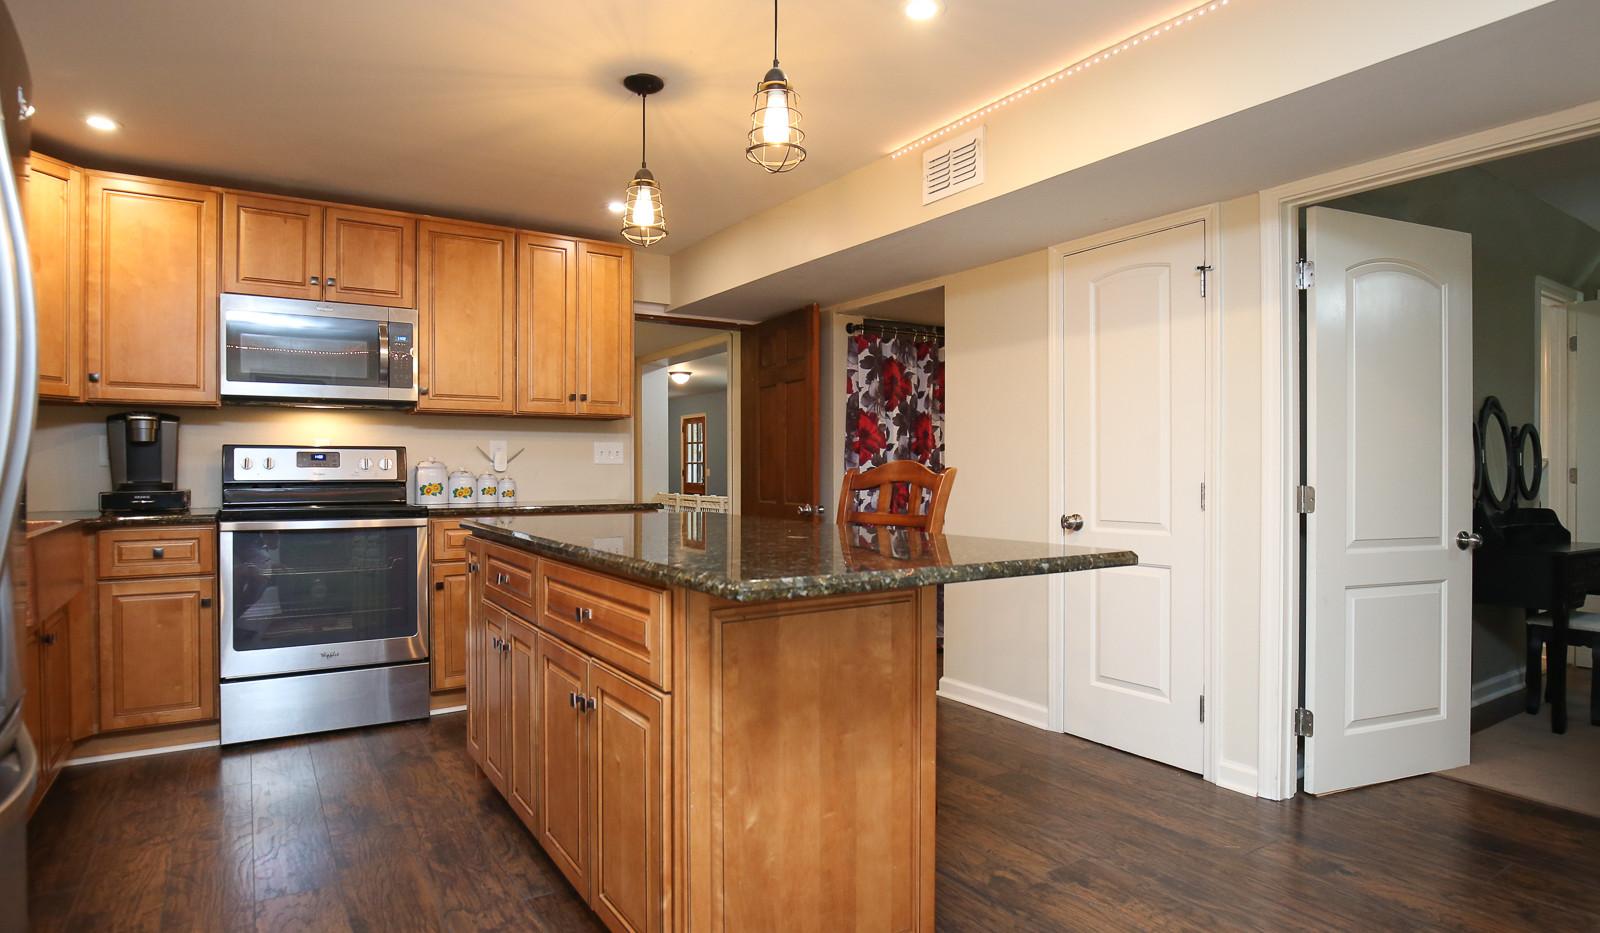 041_294_barnes_ave_kitchen.jpg